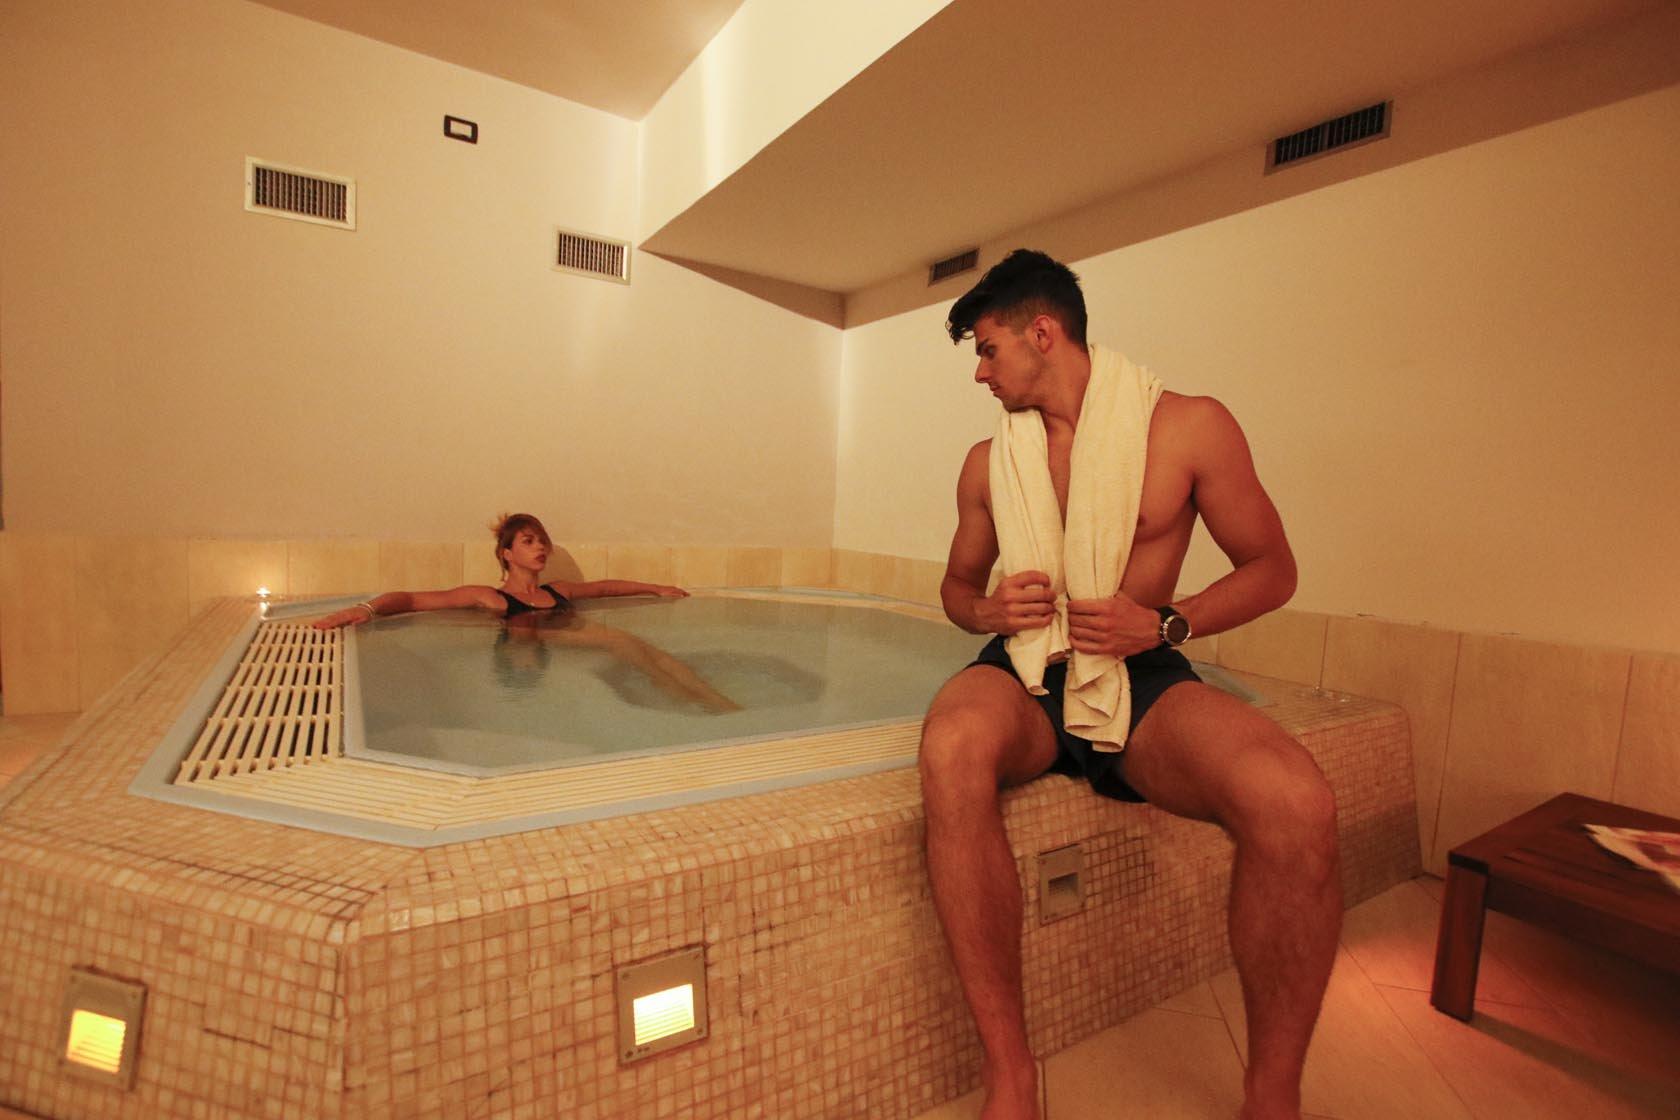 Grifone Hotel - Vasca idromassaggio